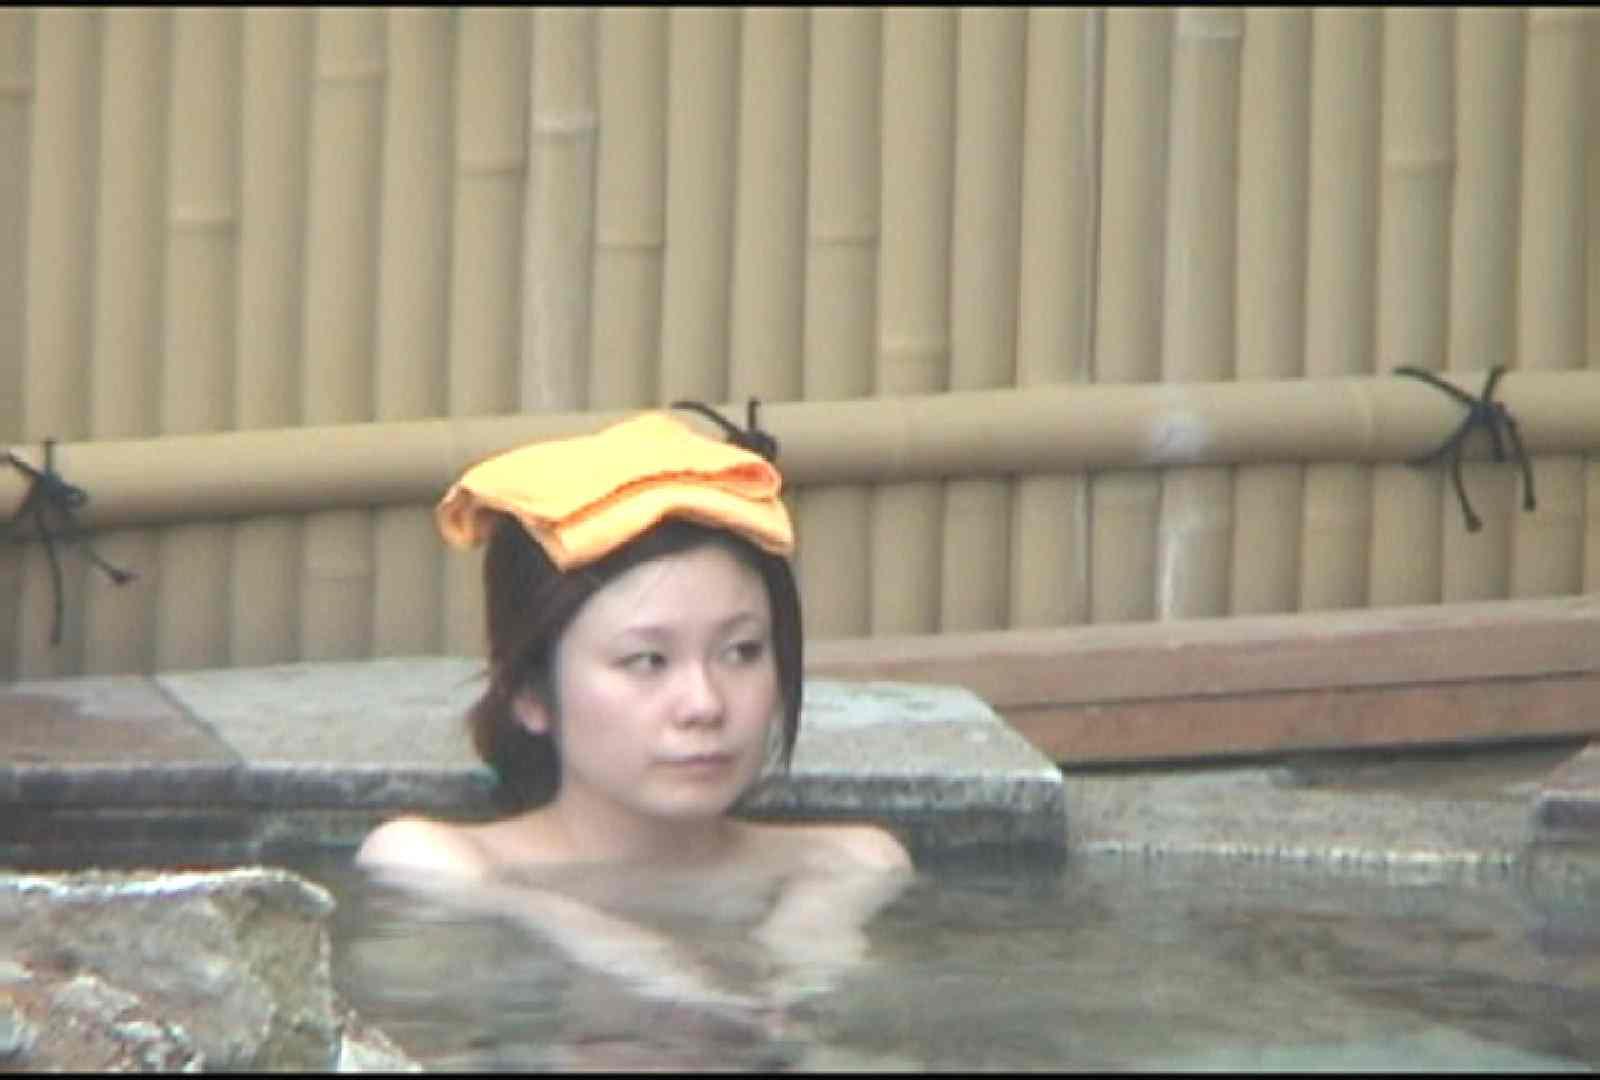 Aquaな露天風呂Vol.177 綺麗なOLたち アダルト動画キャプチャ 112枚 5